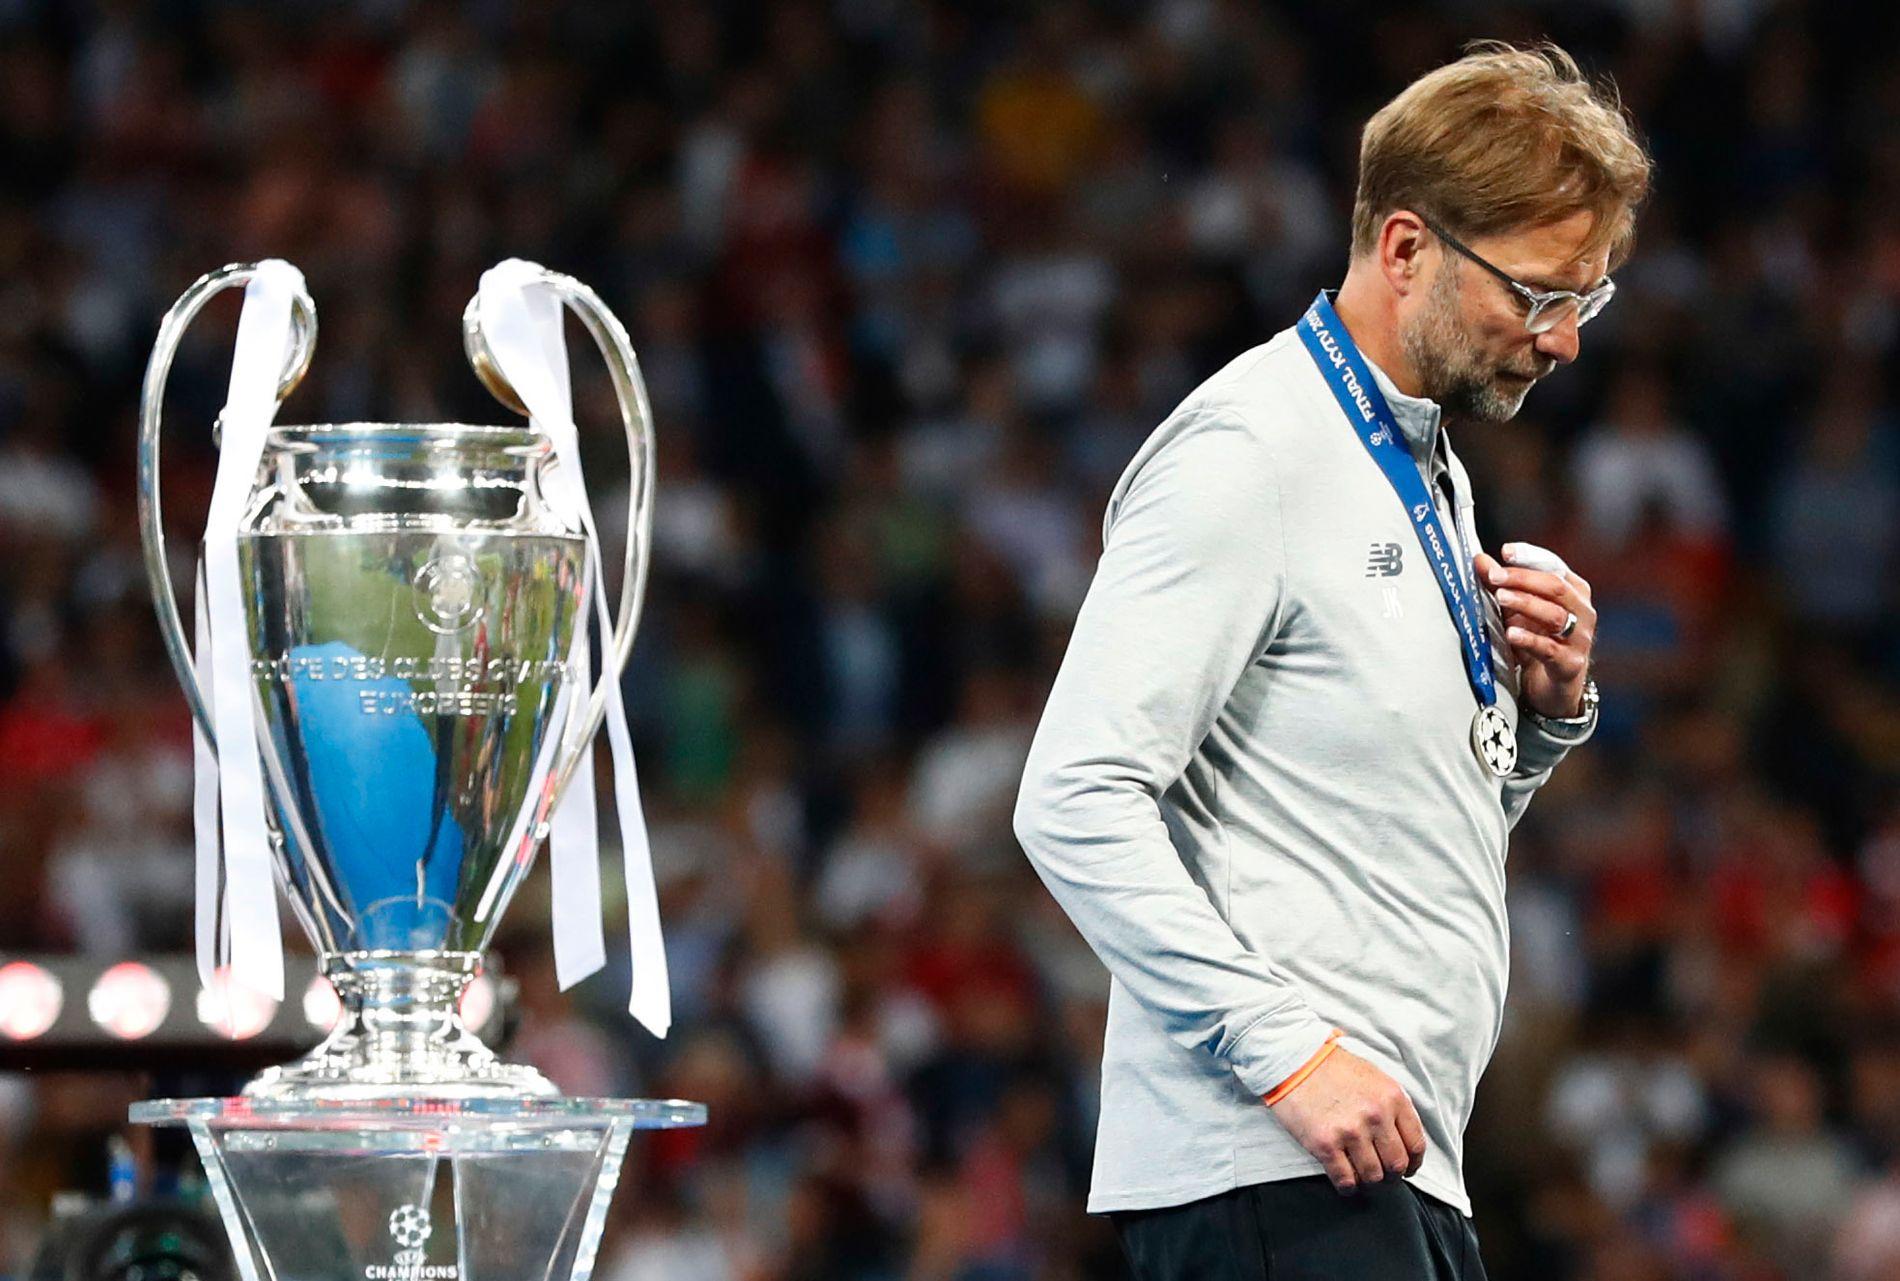 TAPENDE FINALIST: Jürgen Klopp går forbi Champions League-trofeet etter finaletapet mot Real Madrid i mai.